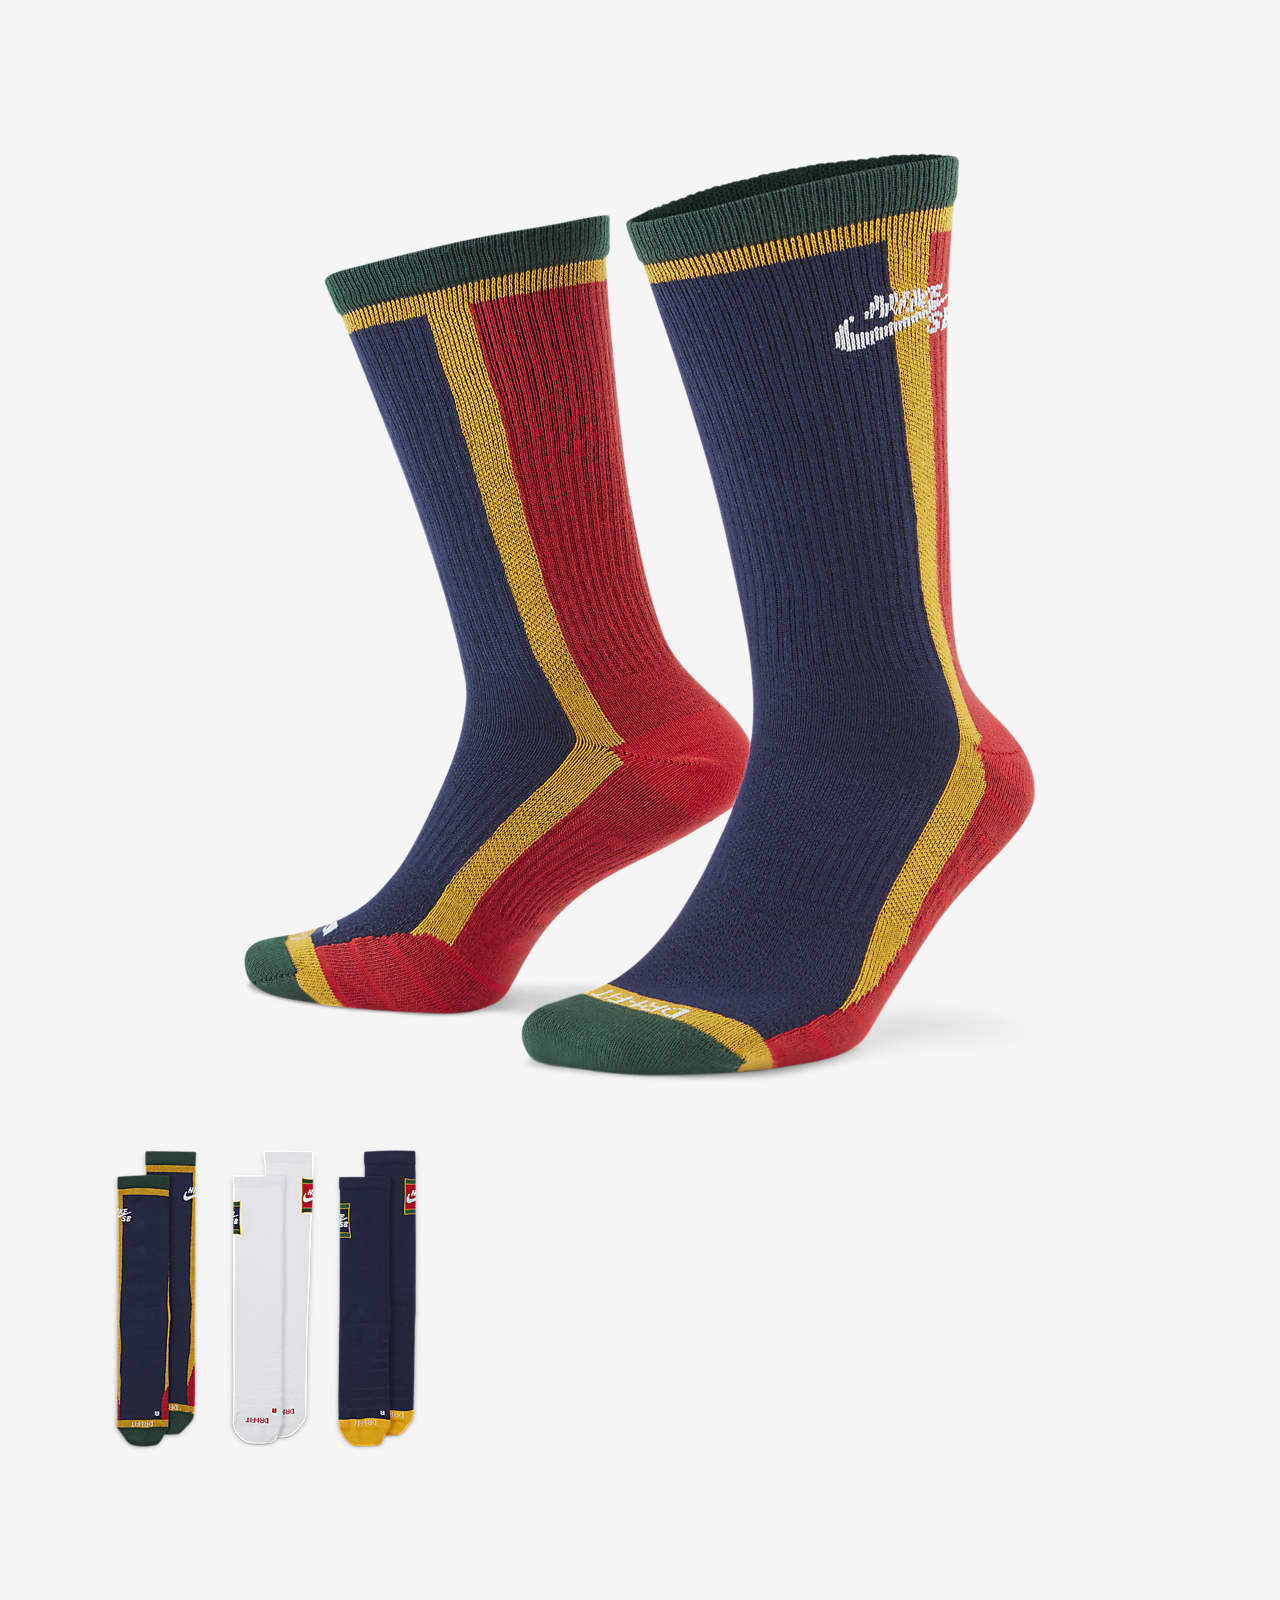 Calcetines deportivos de skateboarding Nike SB Everyday Max Lightweight (3 pares)